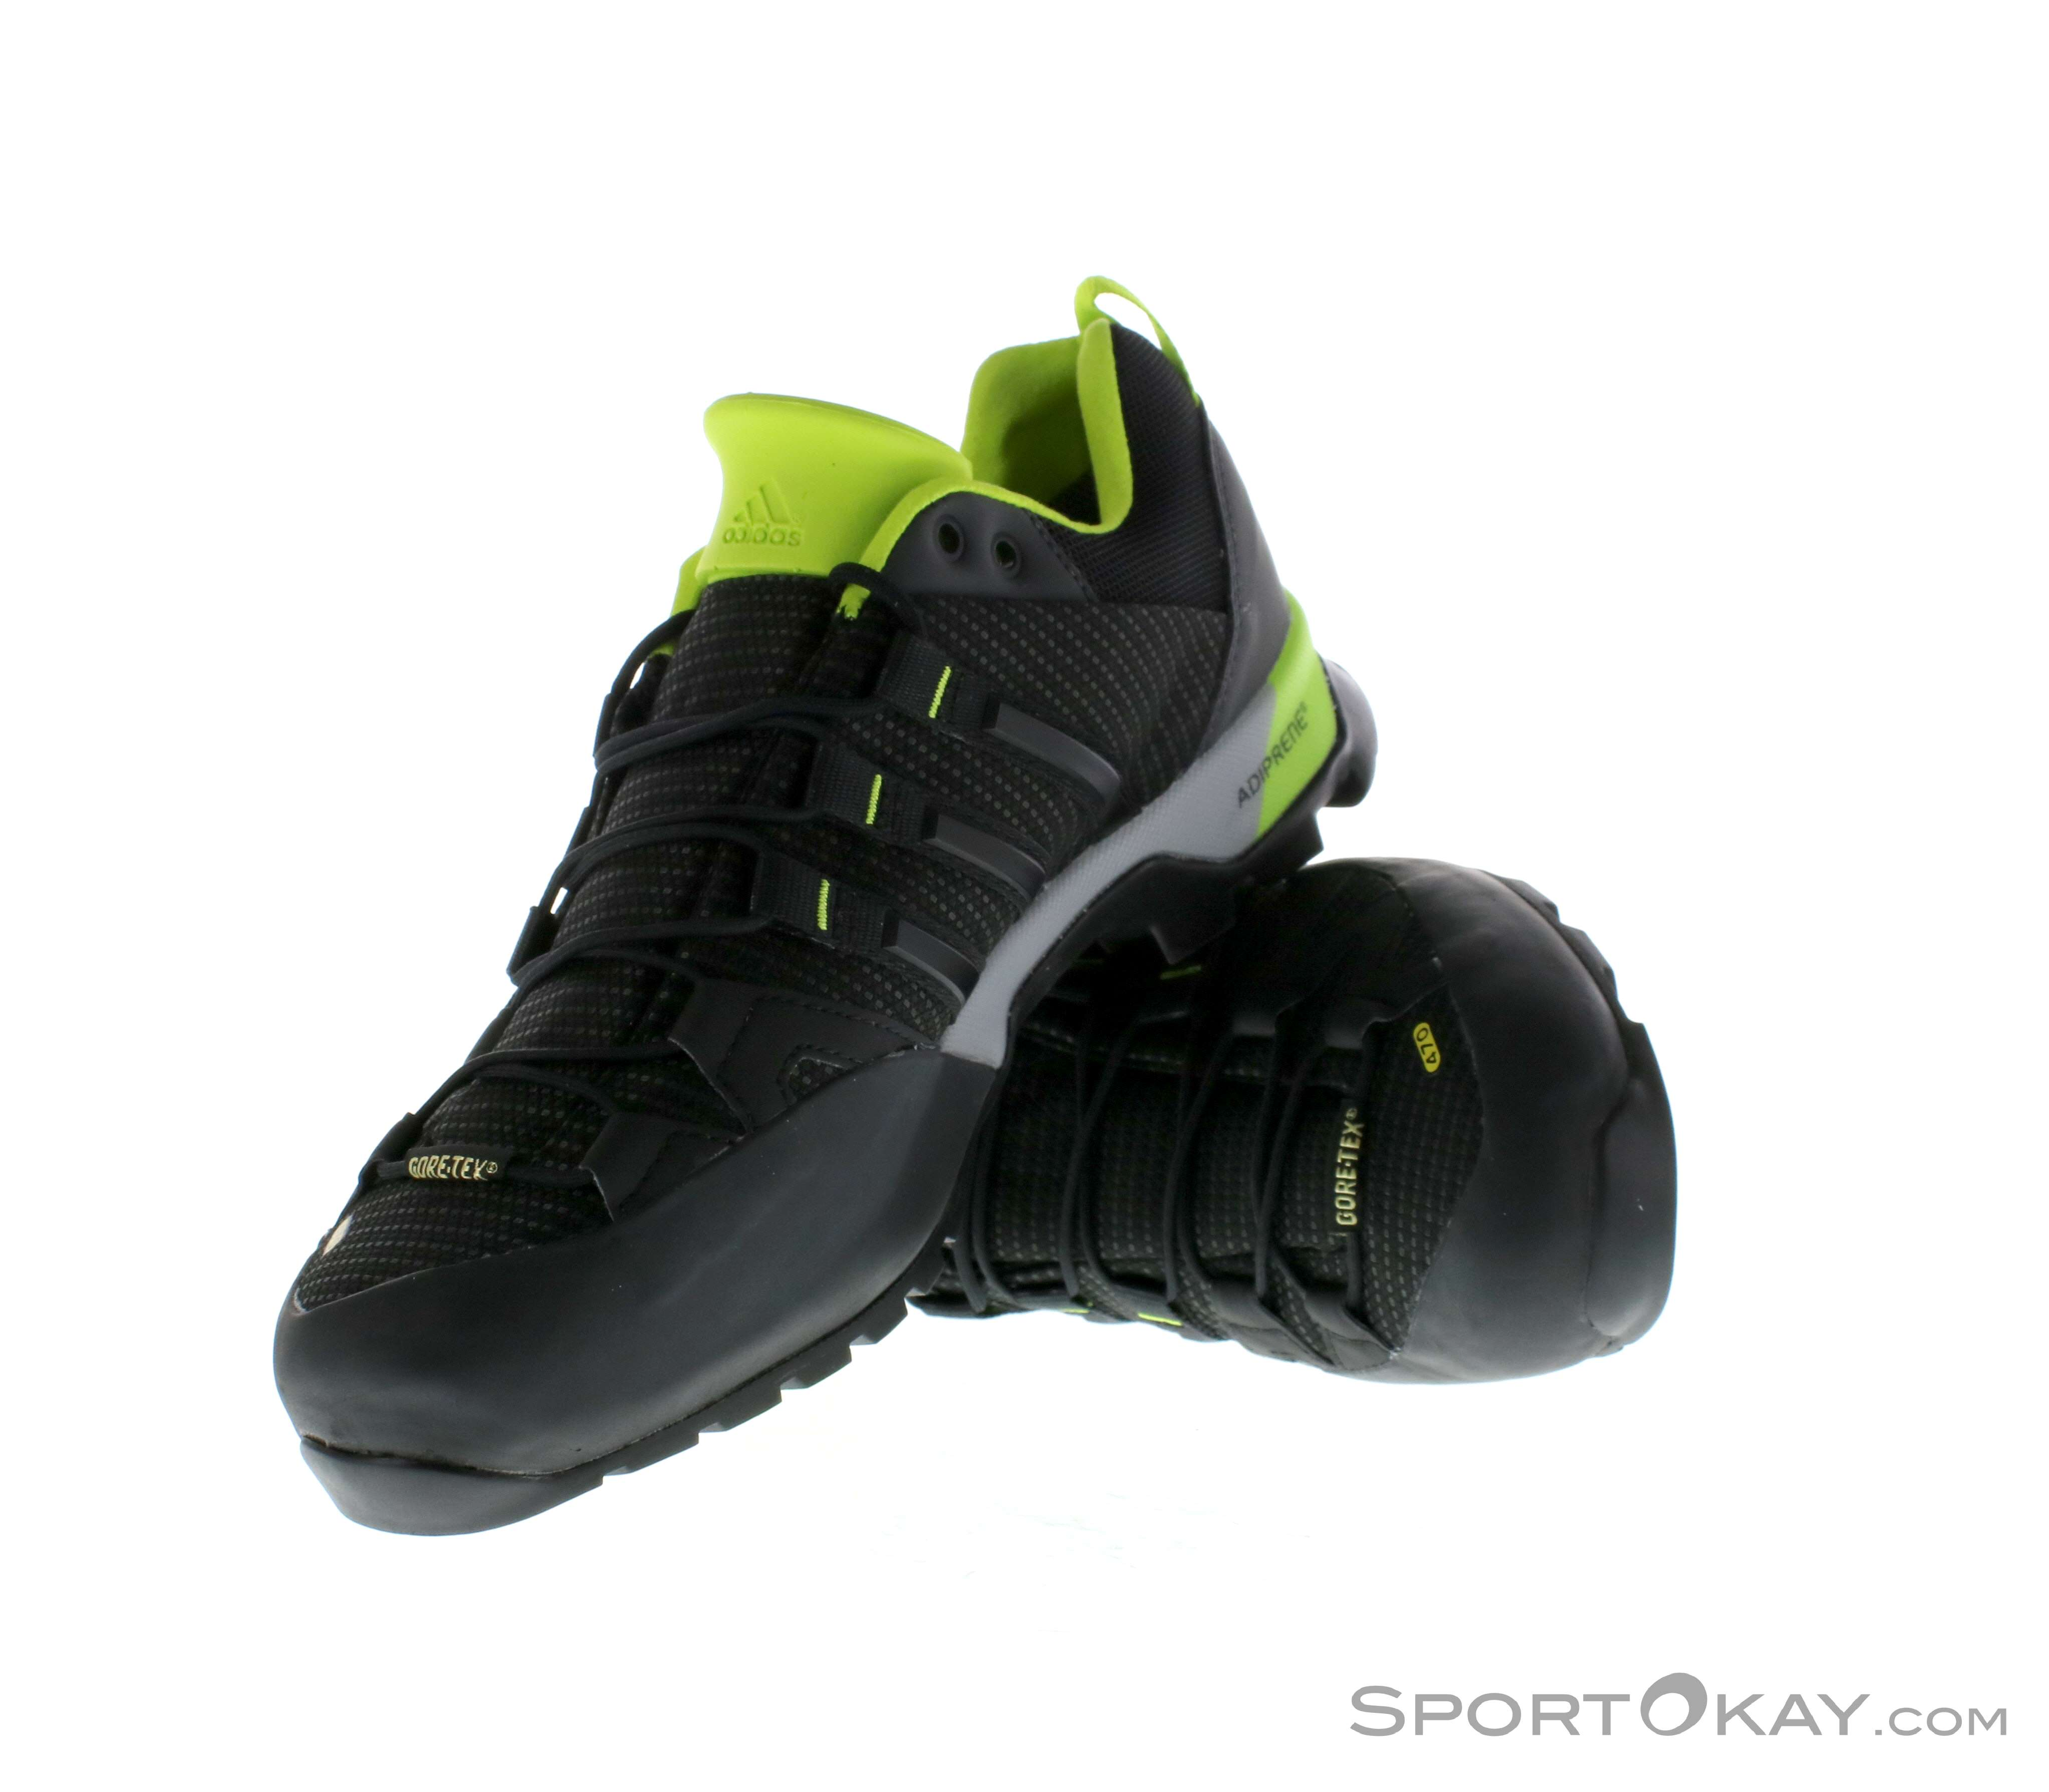 a197c071e7c adidas Terrex Scope GTX Mens Trekking Shoes Gore-Tex - Trekking ...